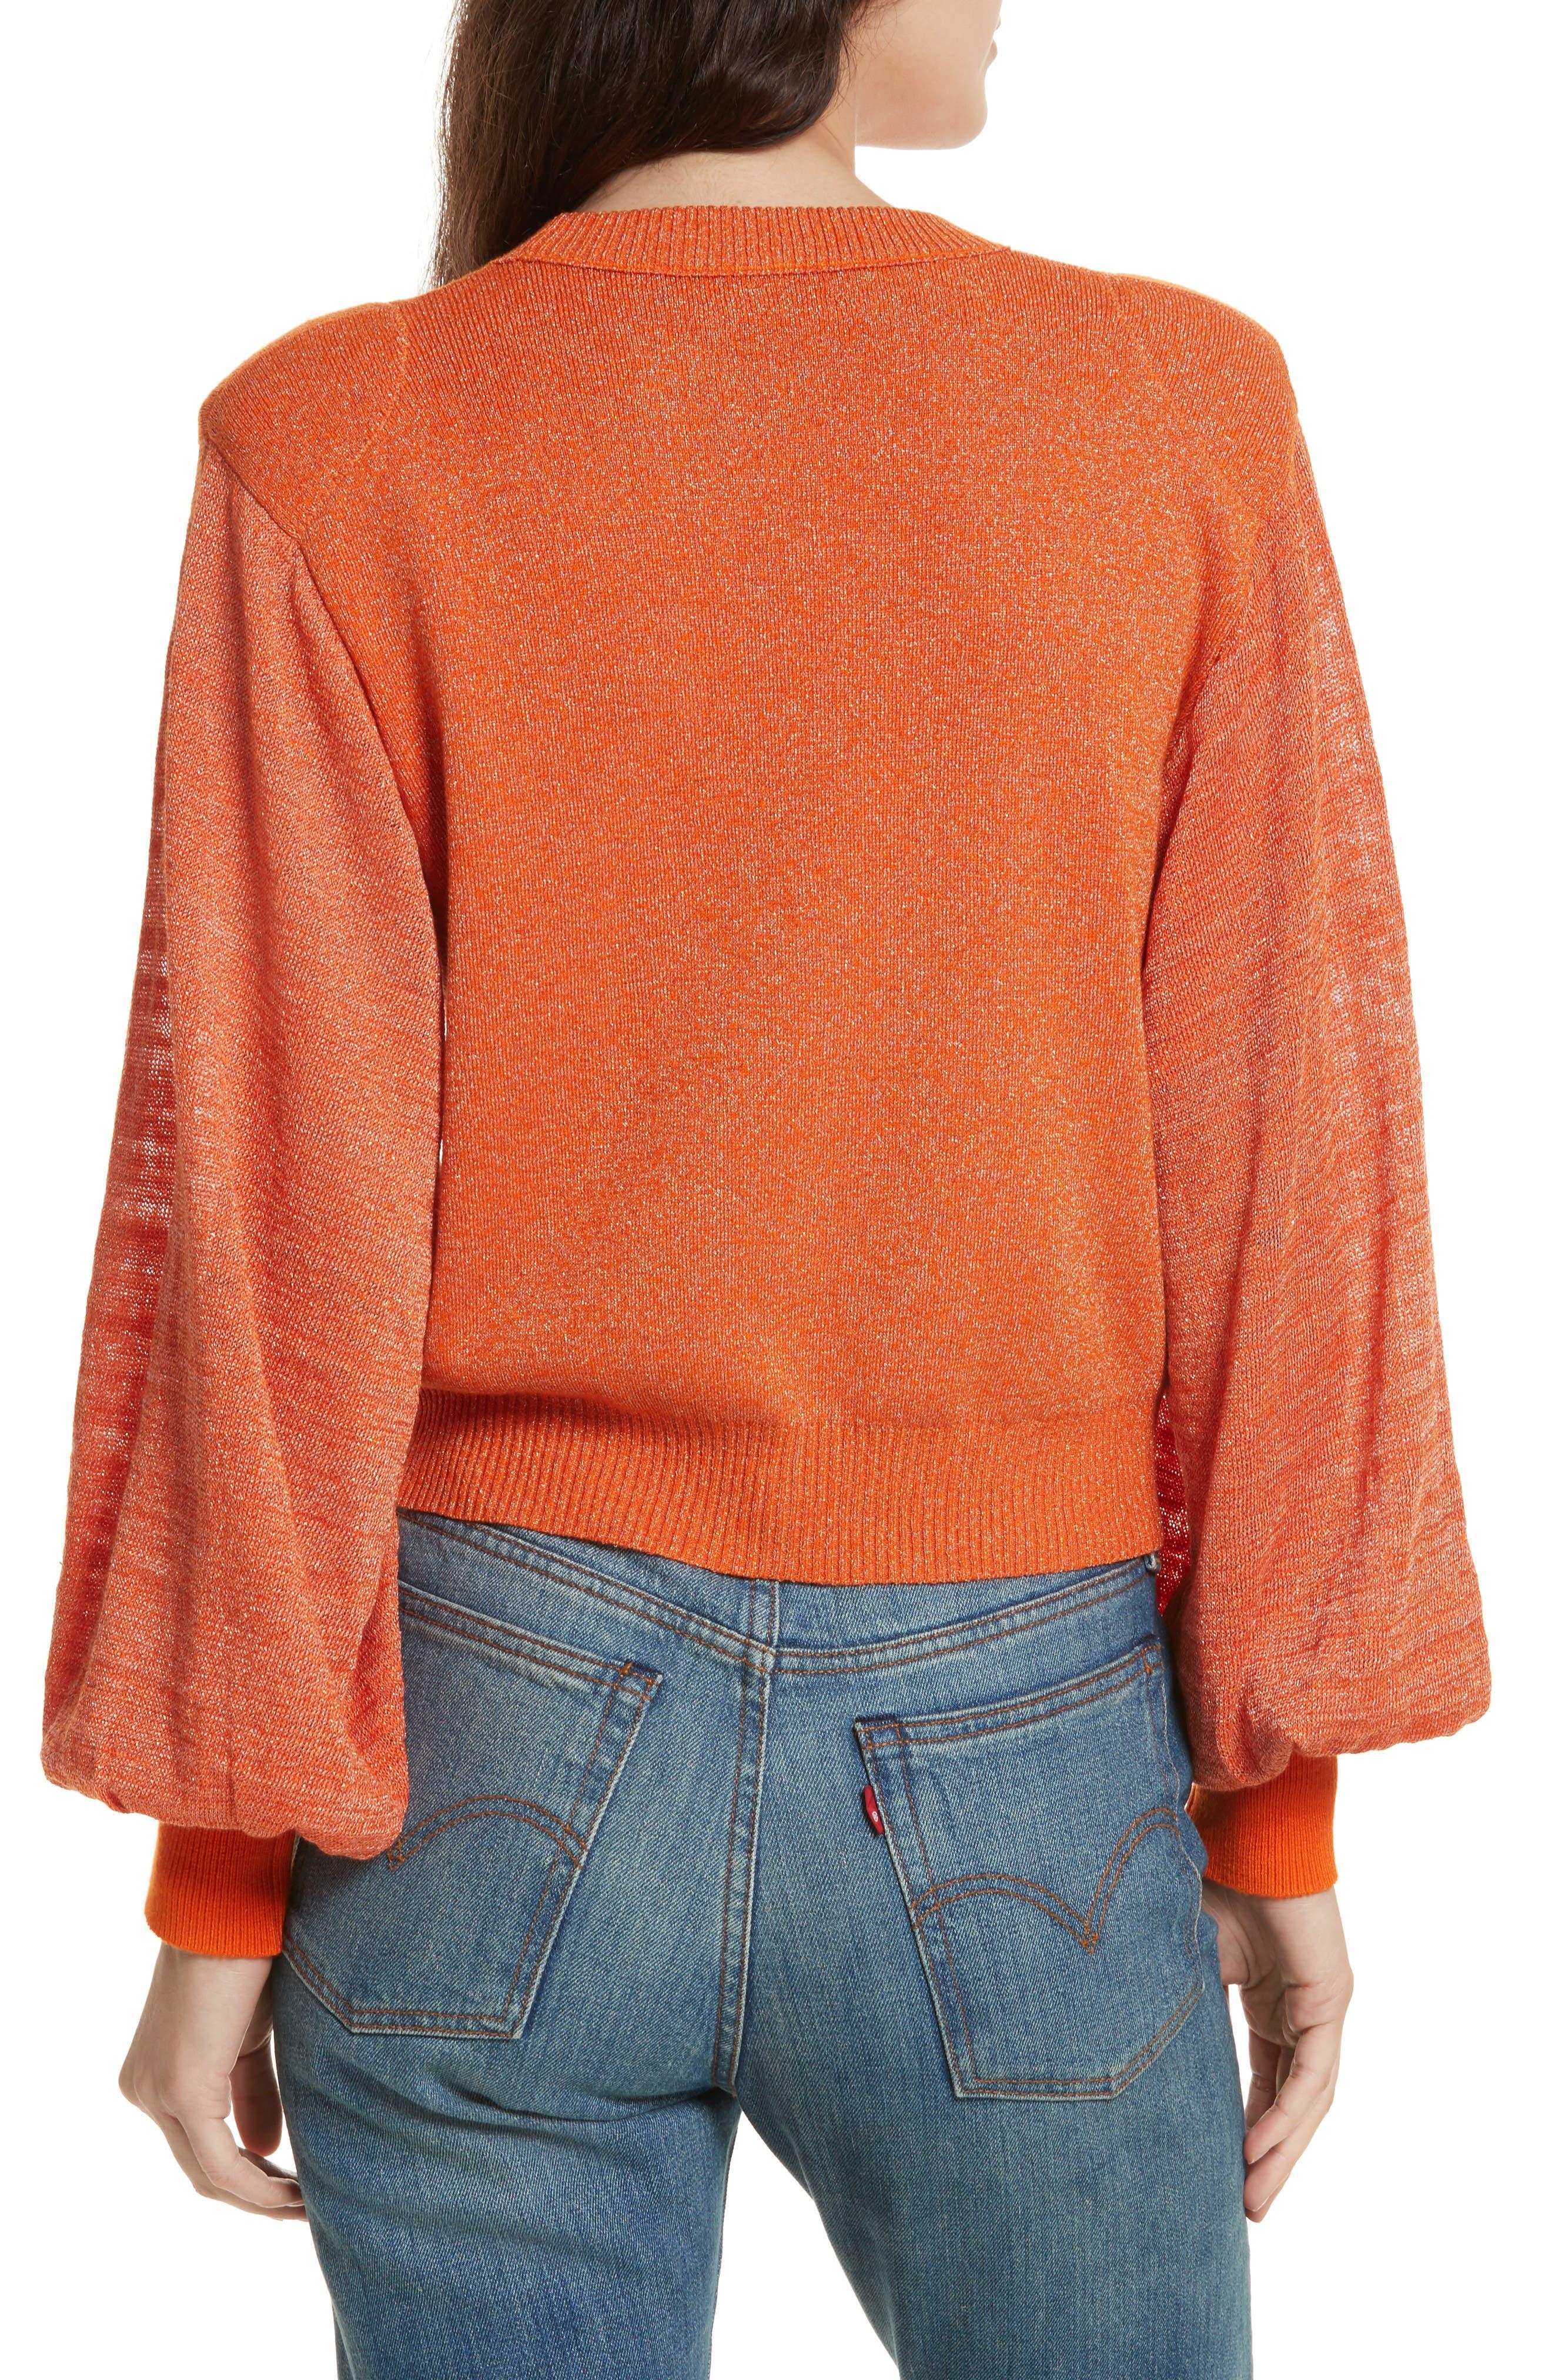 Let it Shine Sweater,                             Alternate thumbnail 6, color,